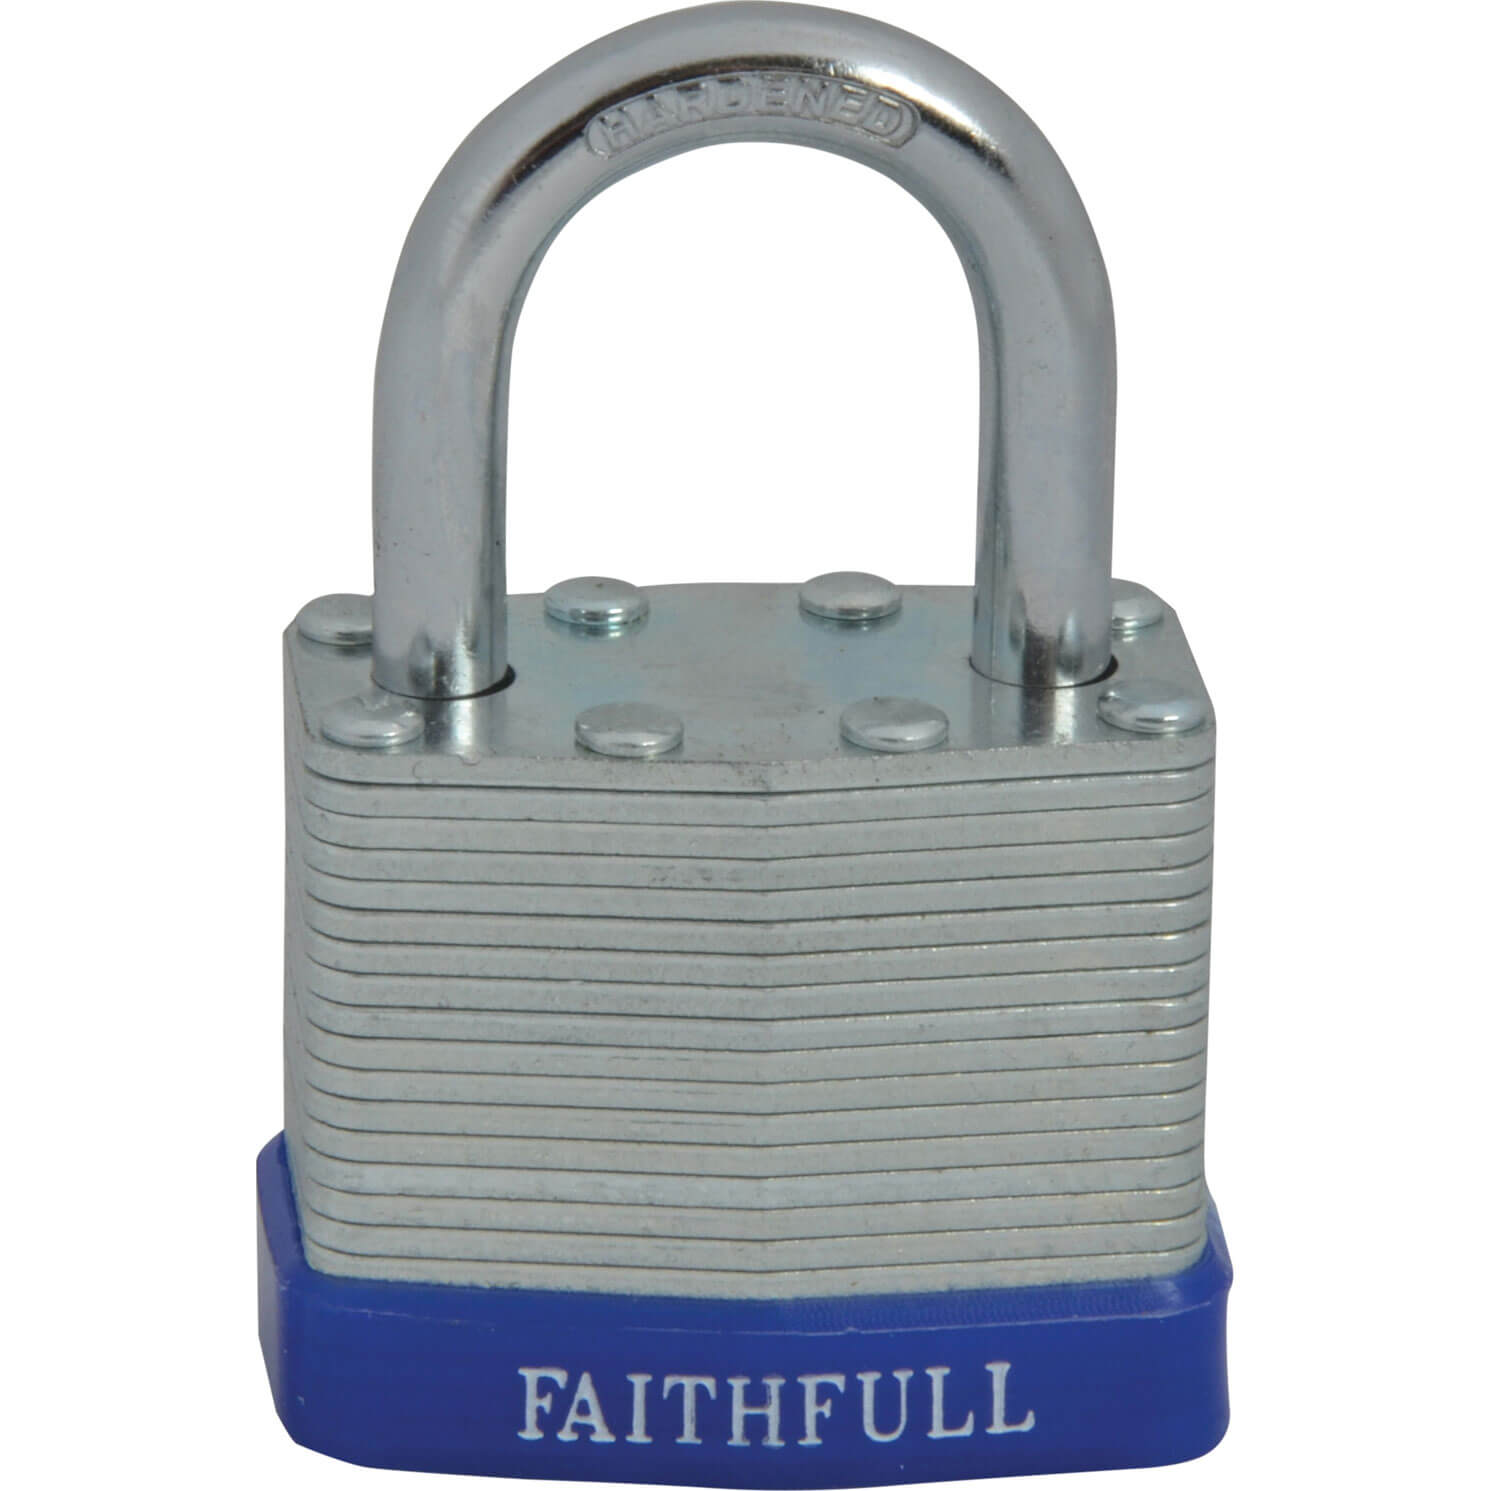 Tooled Up/Ironmongery & Security/Security/Faithfull 40mm Laminated Steel Padlock